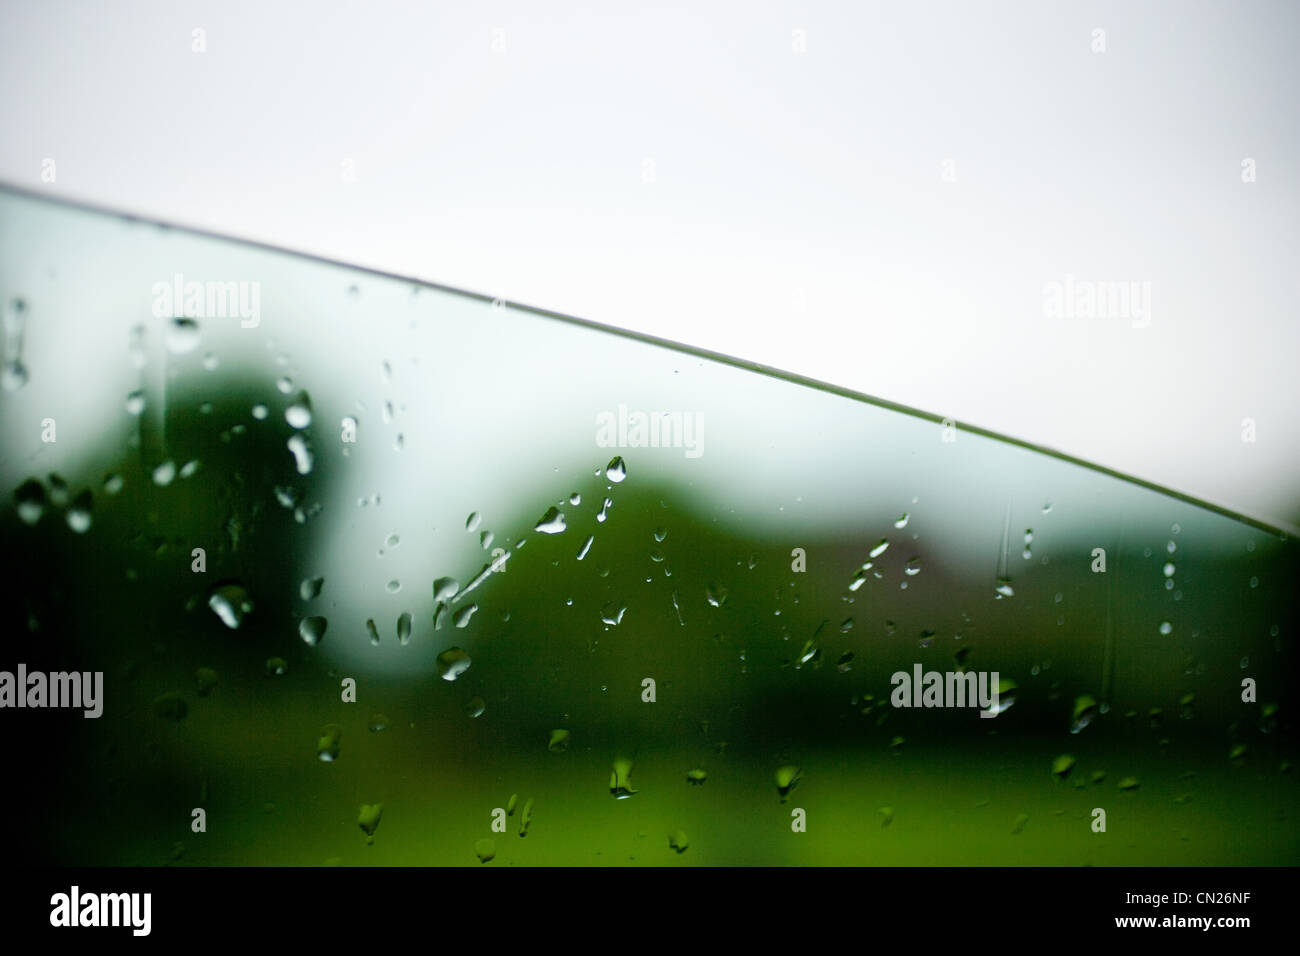 Raindrops on car window - Stock Image